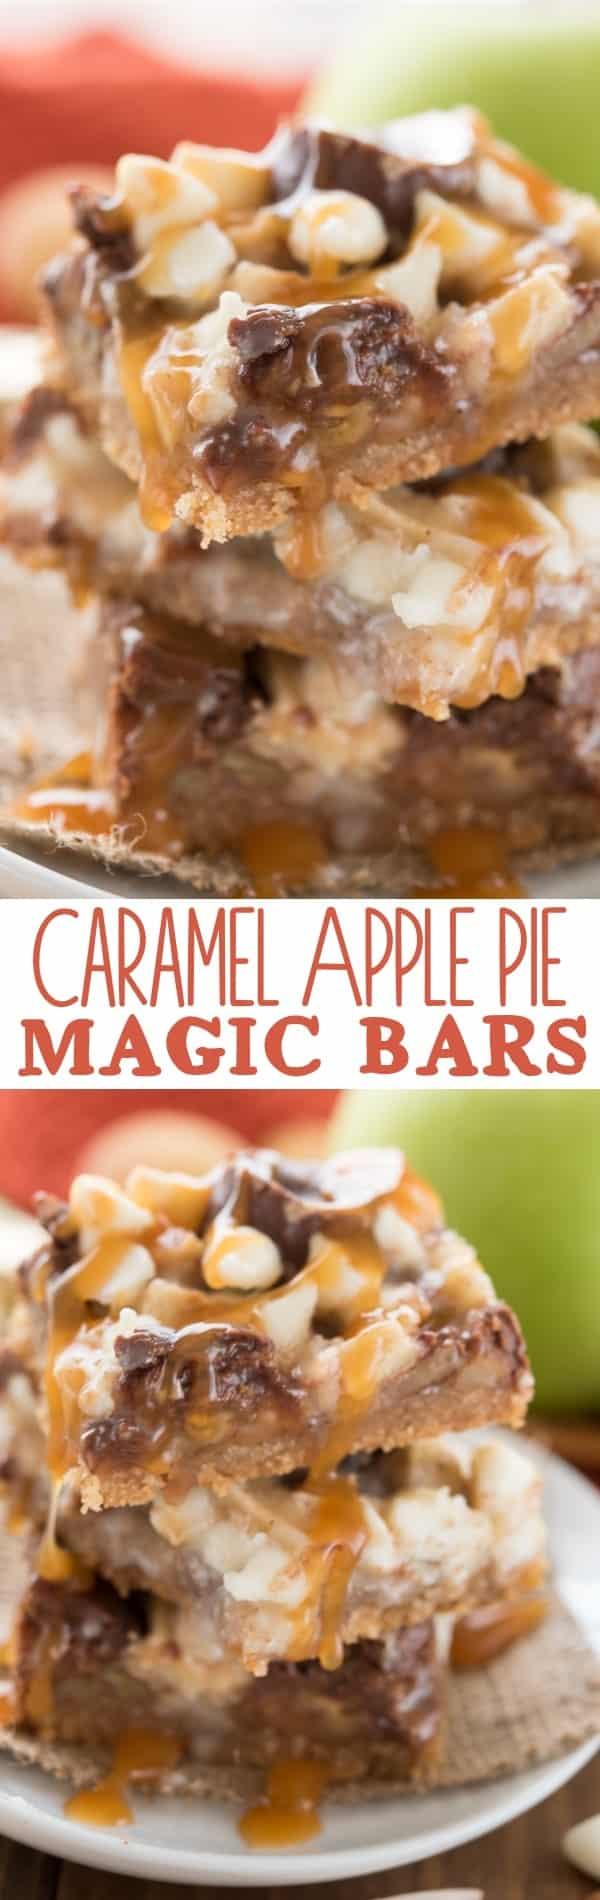 Caramel Apple Pie Magic Bars! An easy recipe for fall full of caramel ...